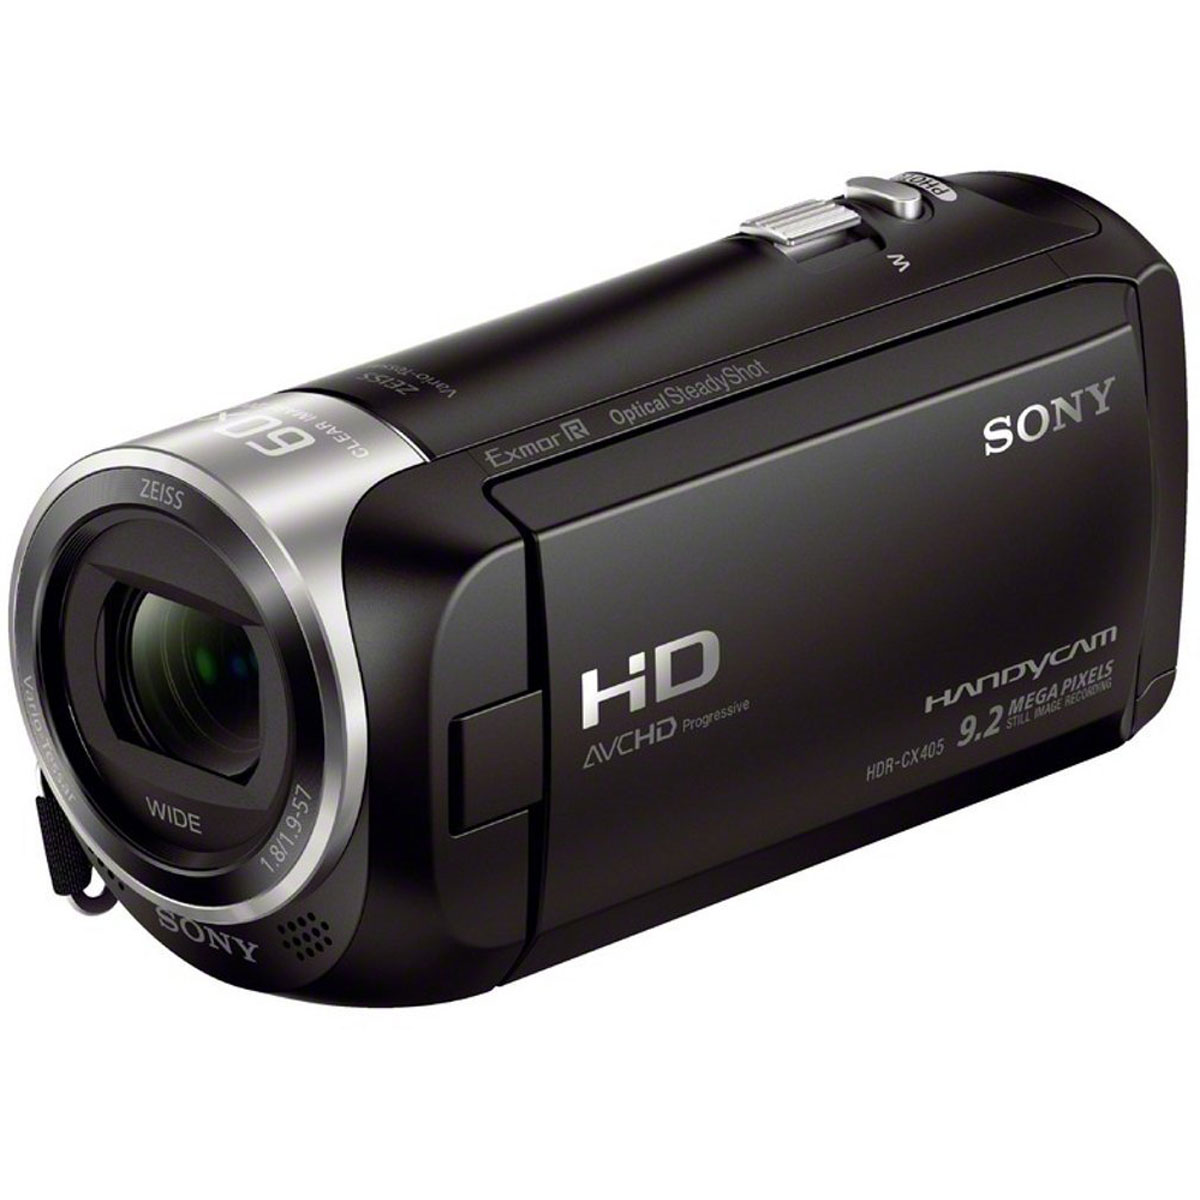 лучшая цена Видеокамера Sony HDR-CX405B